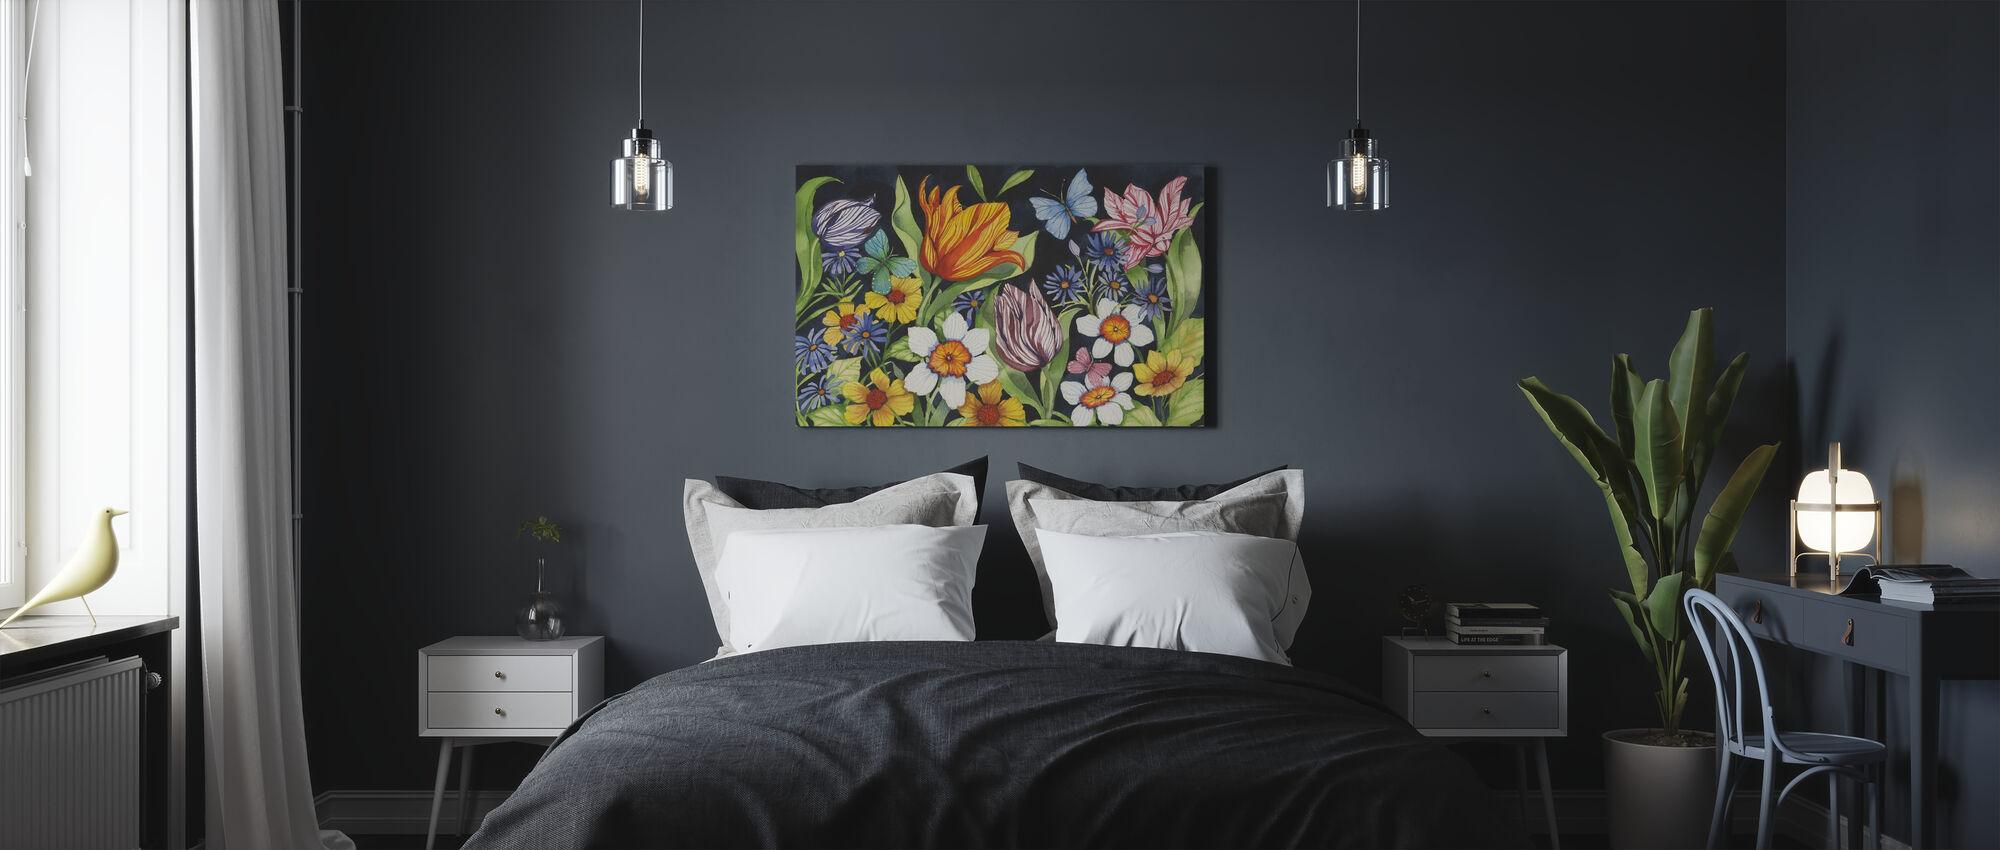 Floral Noir - Leinwandbild - Schlafzimmer